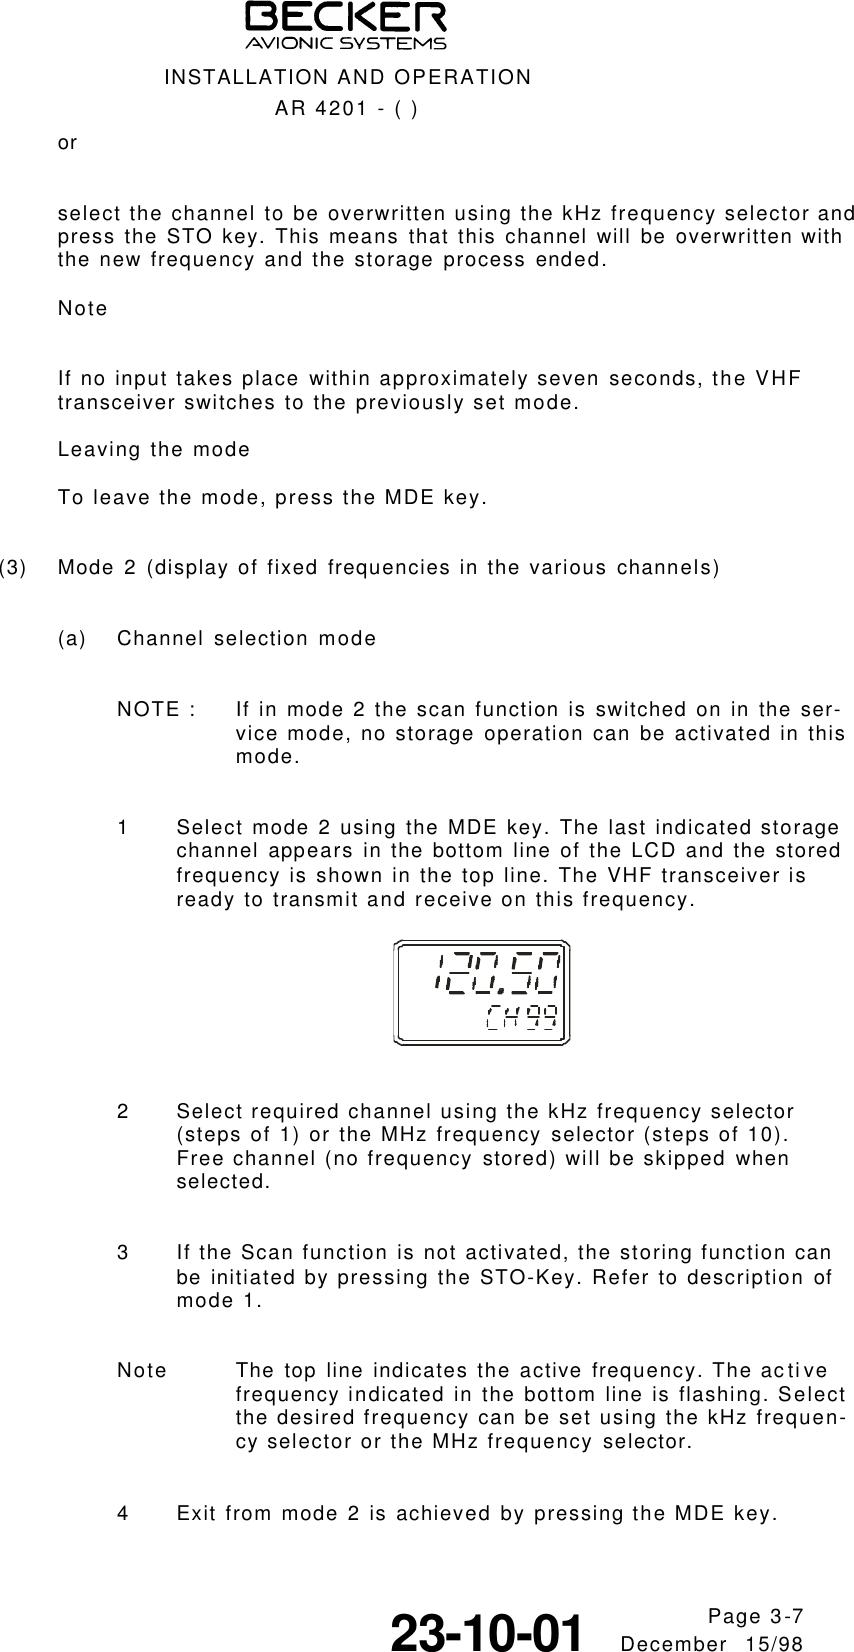 TITEL 1 Becker AR4201 Manual 1998 12 15